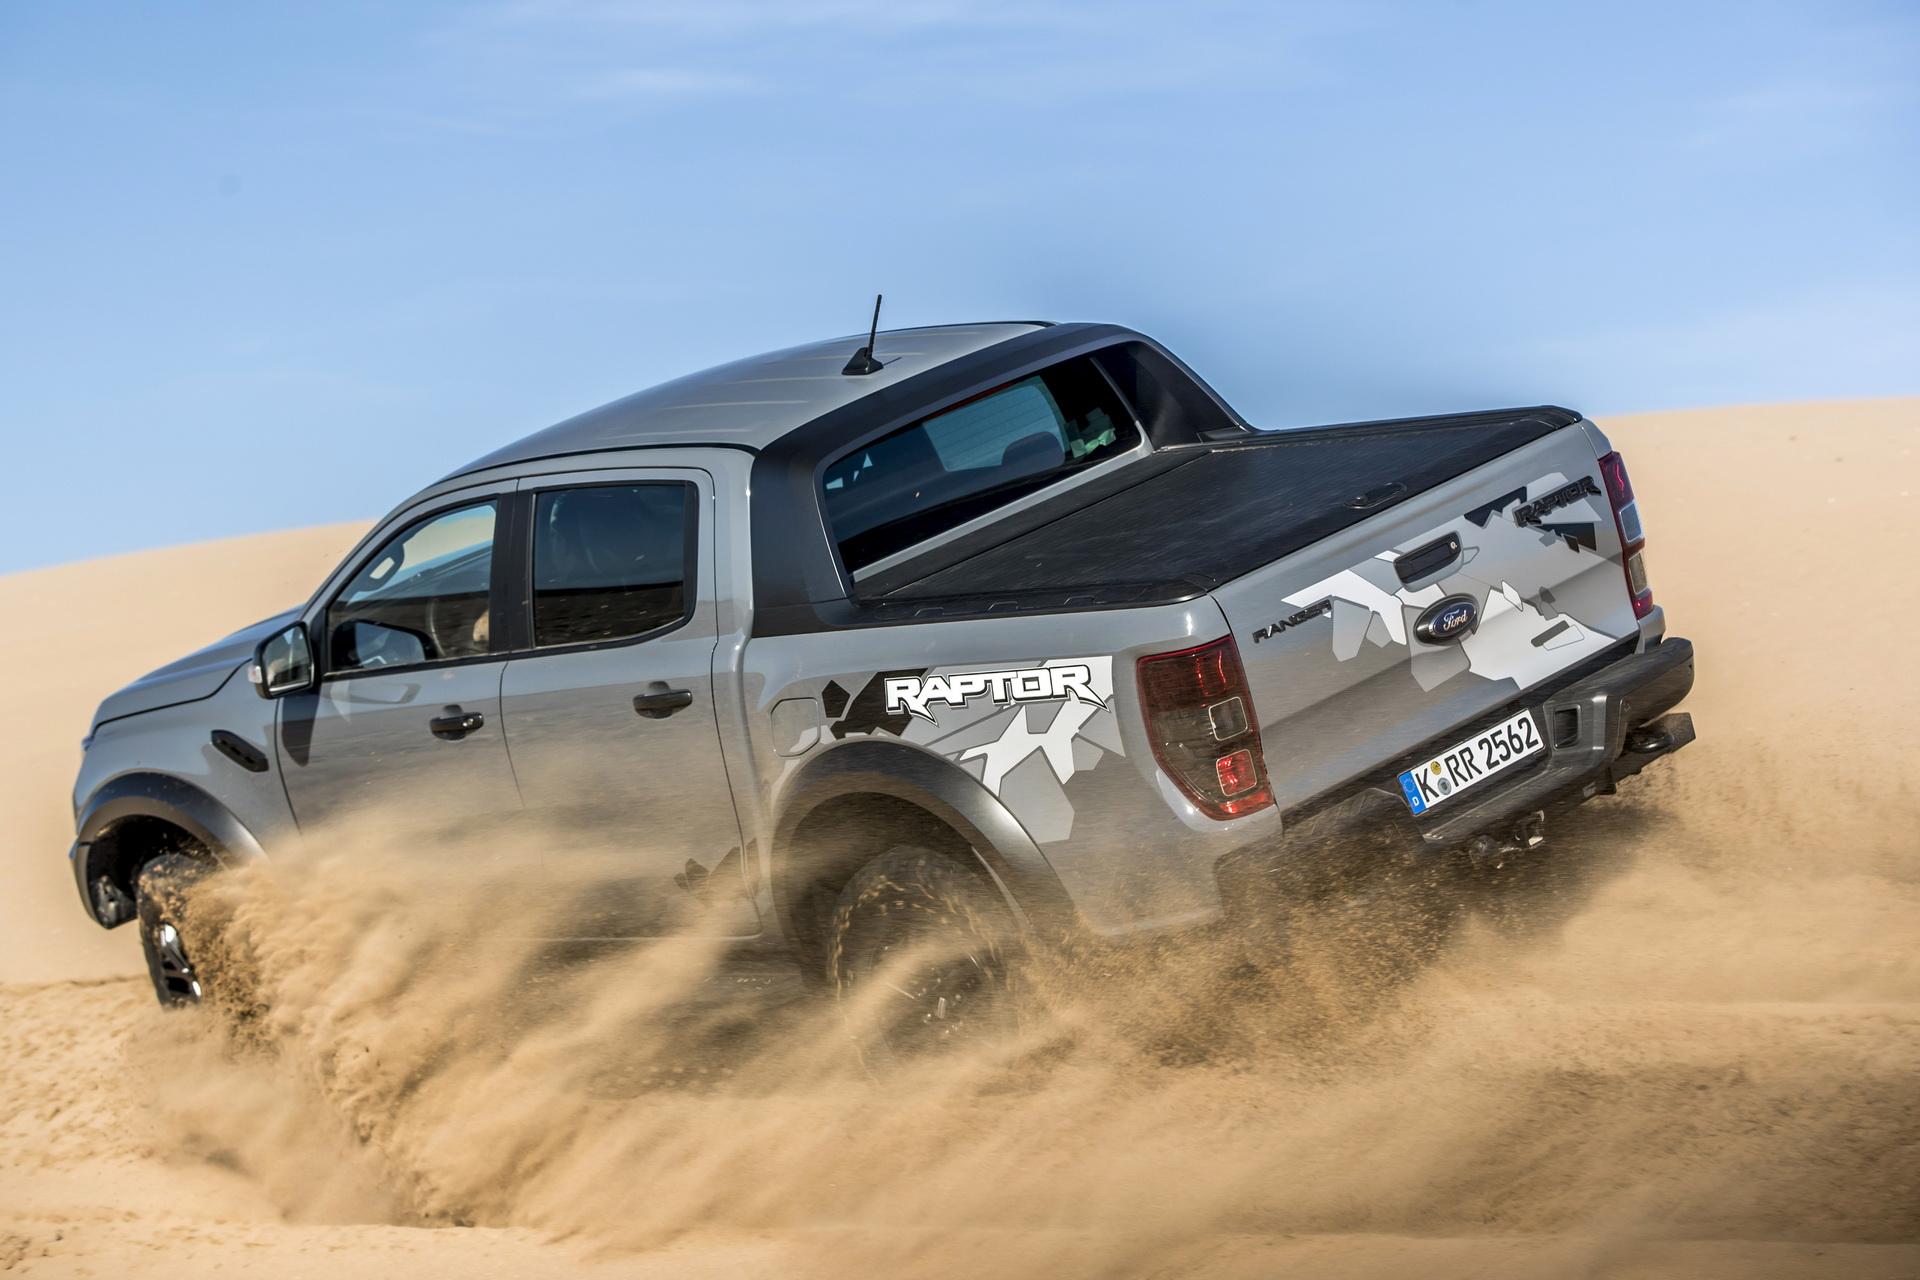 Next Ford Ranger Raptor Bound For The U.S. With 2.7-Liter V6